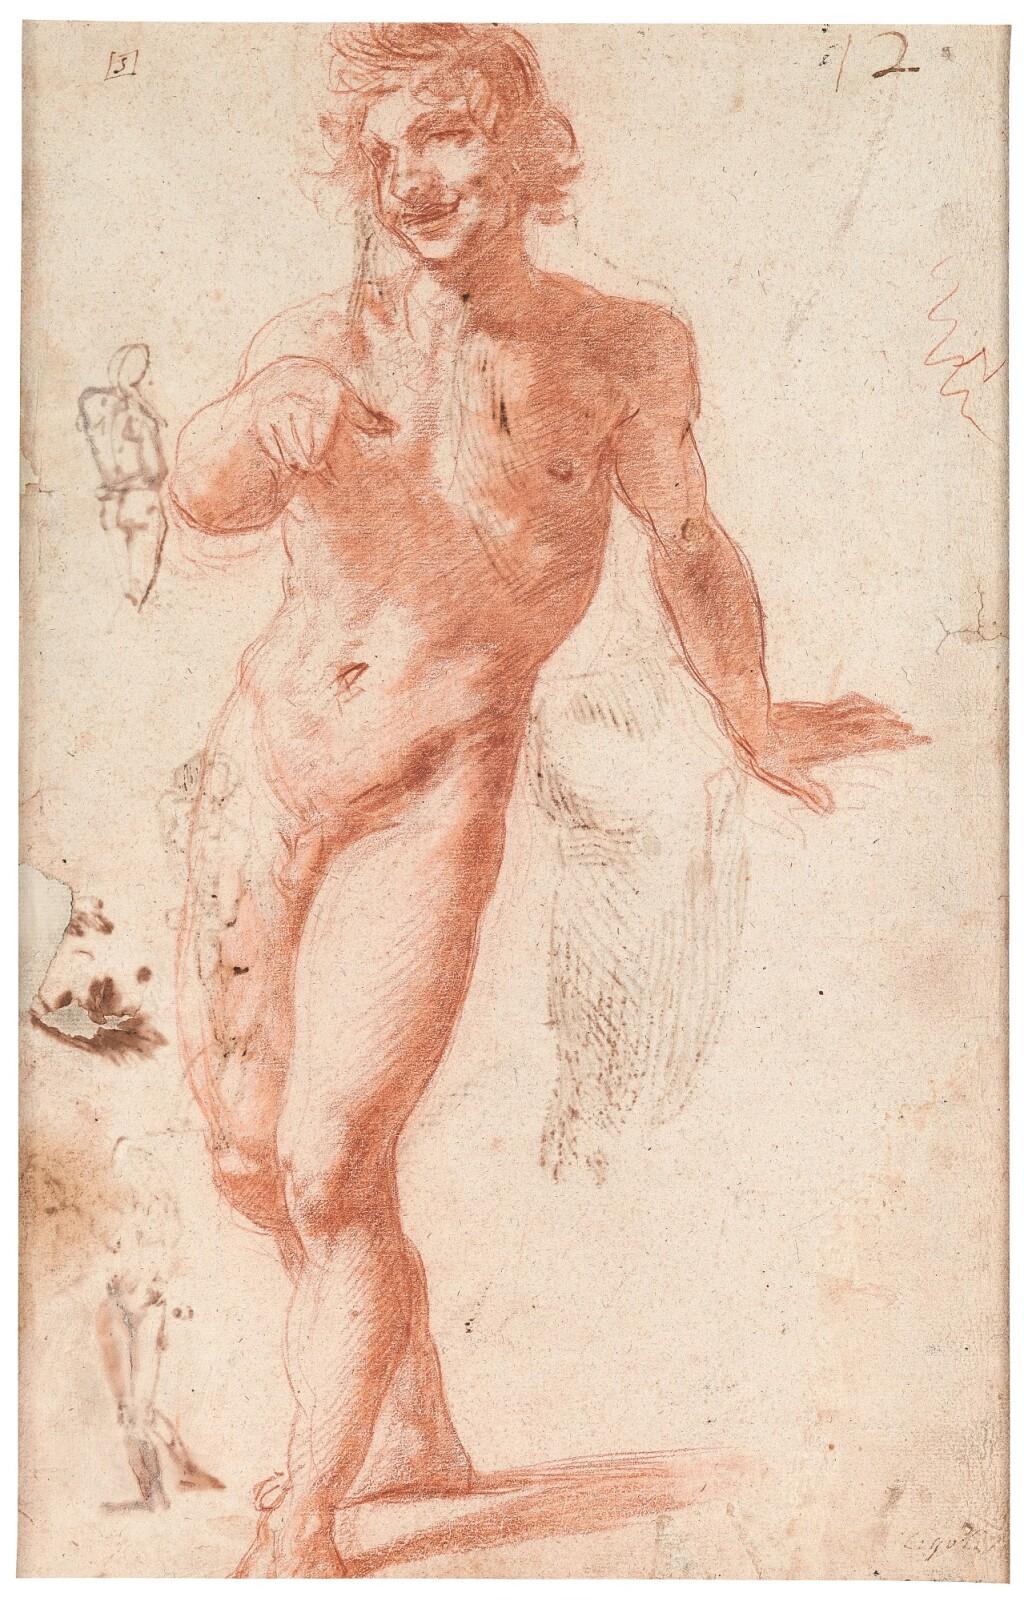 LODOVICO CARDI, CALLED IL CIGOLI   RECTO:  STUDY OF A MALE NUDE, WALKING VERSO: STUDIES OF NUDES